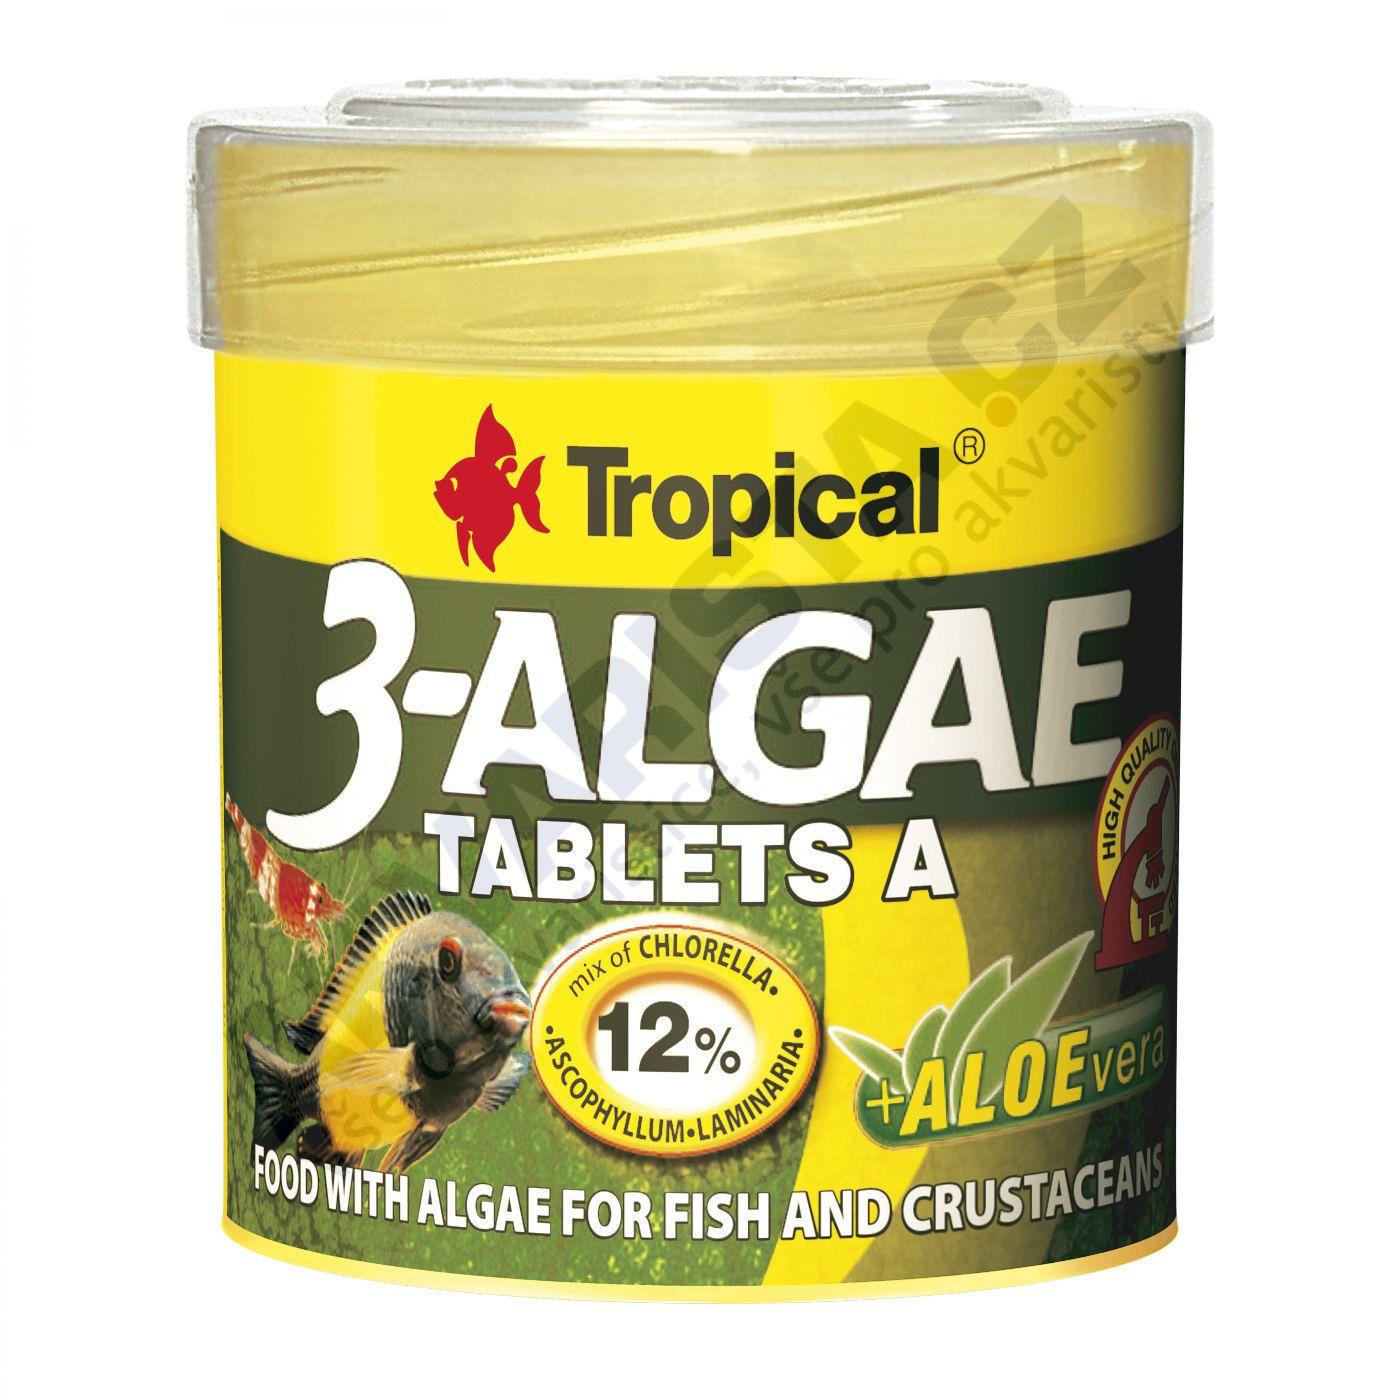 Tropical 3-algae tablets A (samolepící tablety) 50 ml